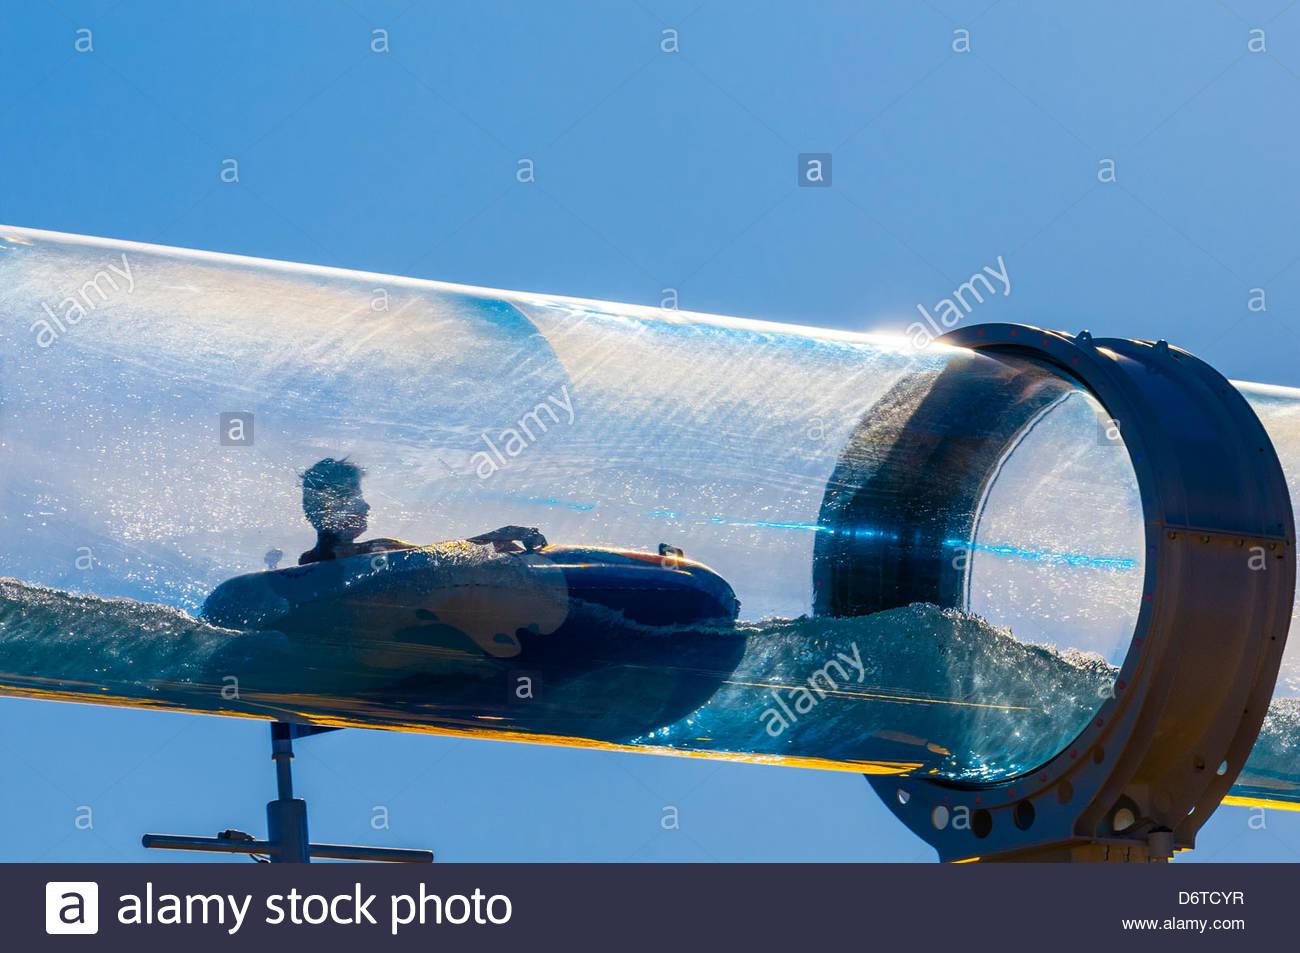 AquaDuck Water Coaster Disney Dream Cruise Ship Disney Cruise - Cruises from florida to bahamas